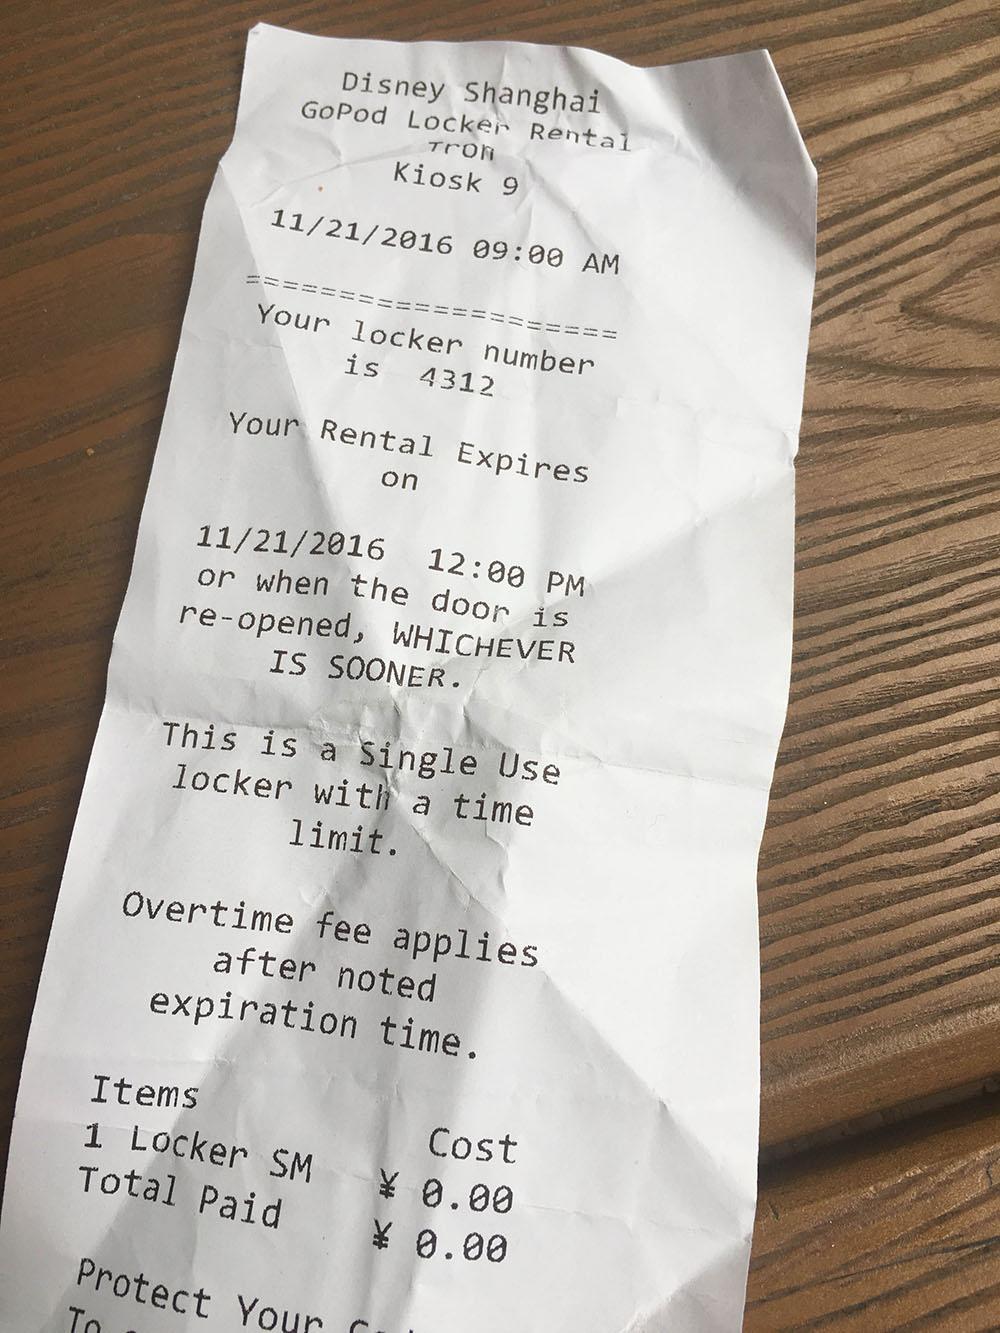 shanghaidisney_locker_receipt